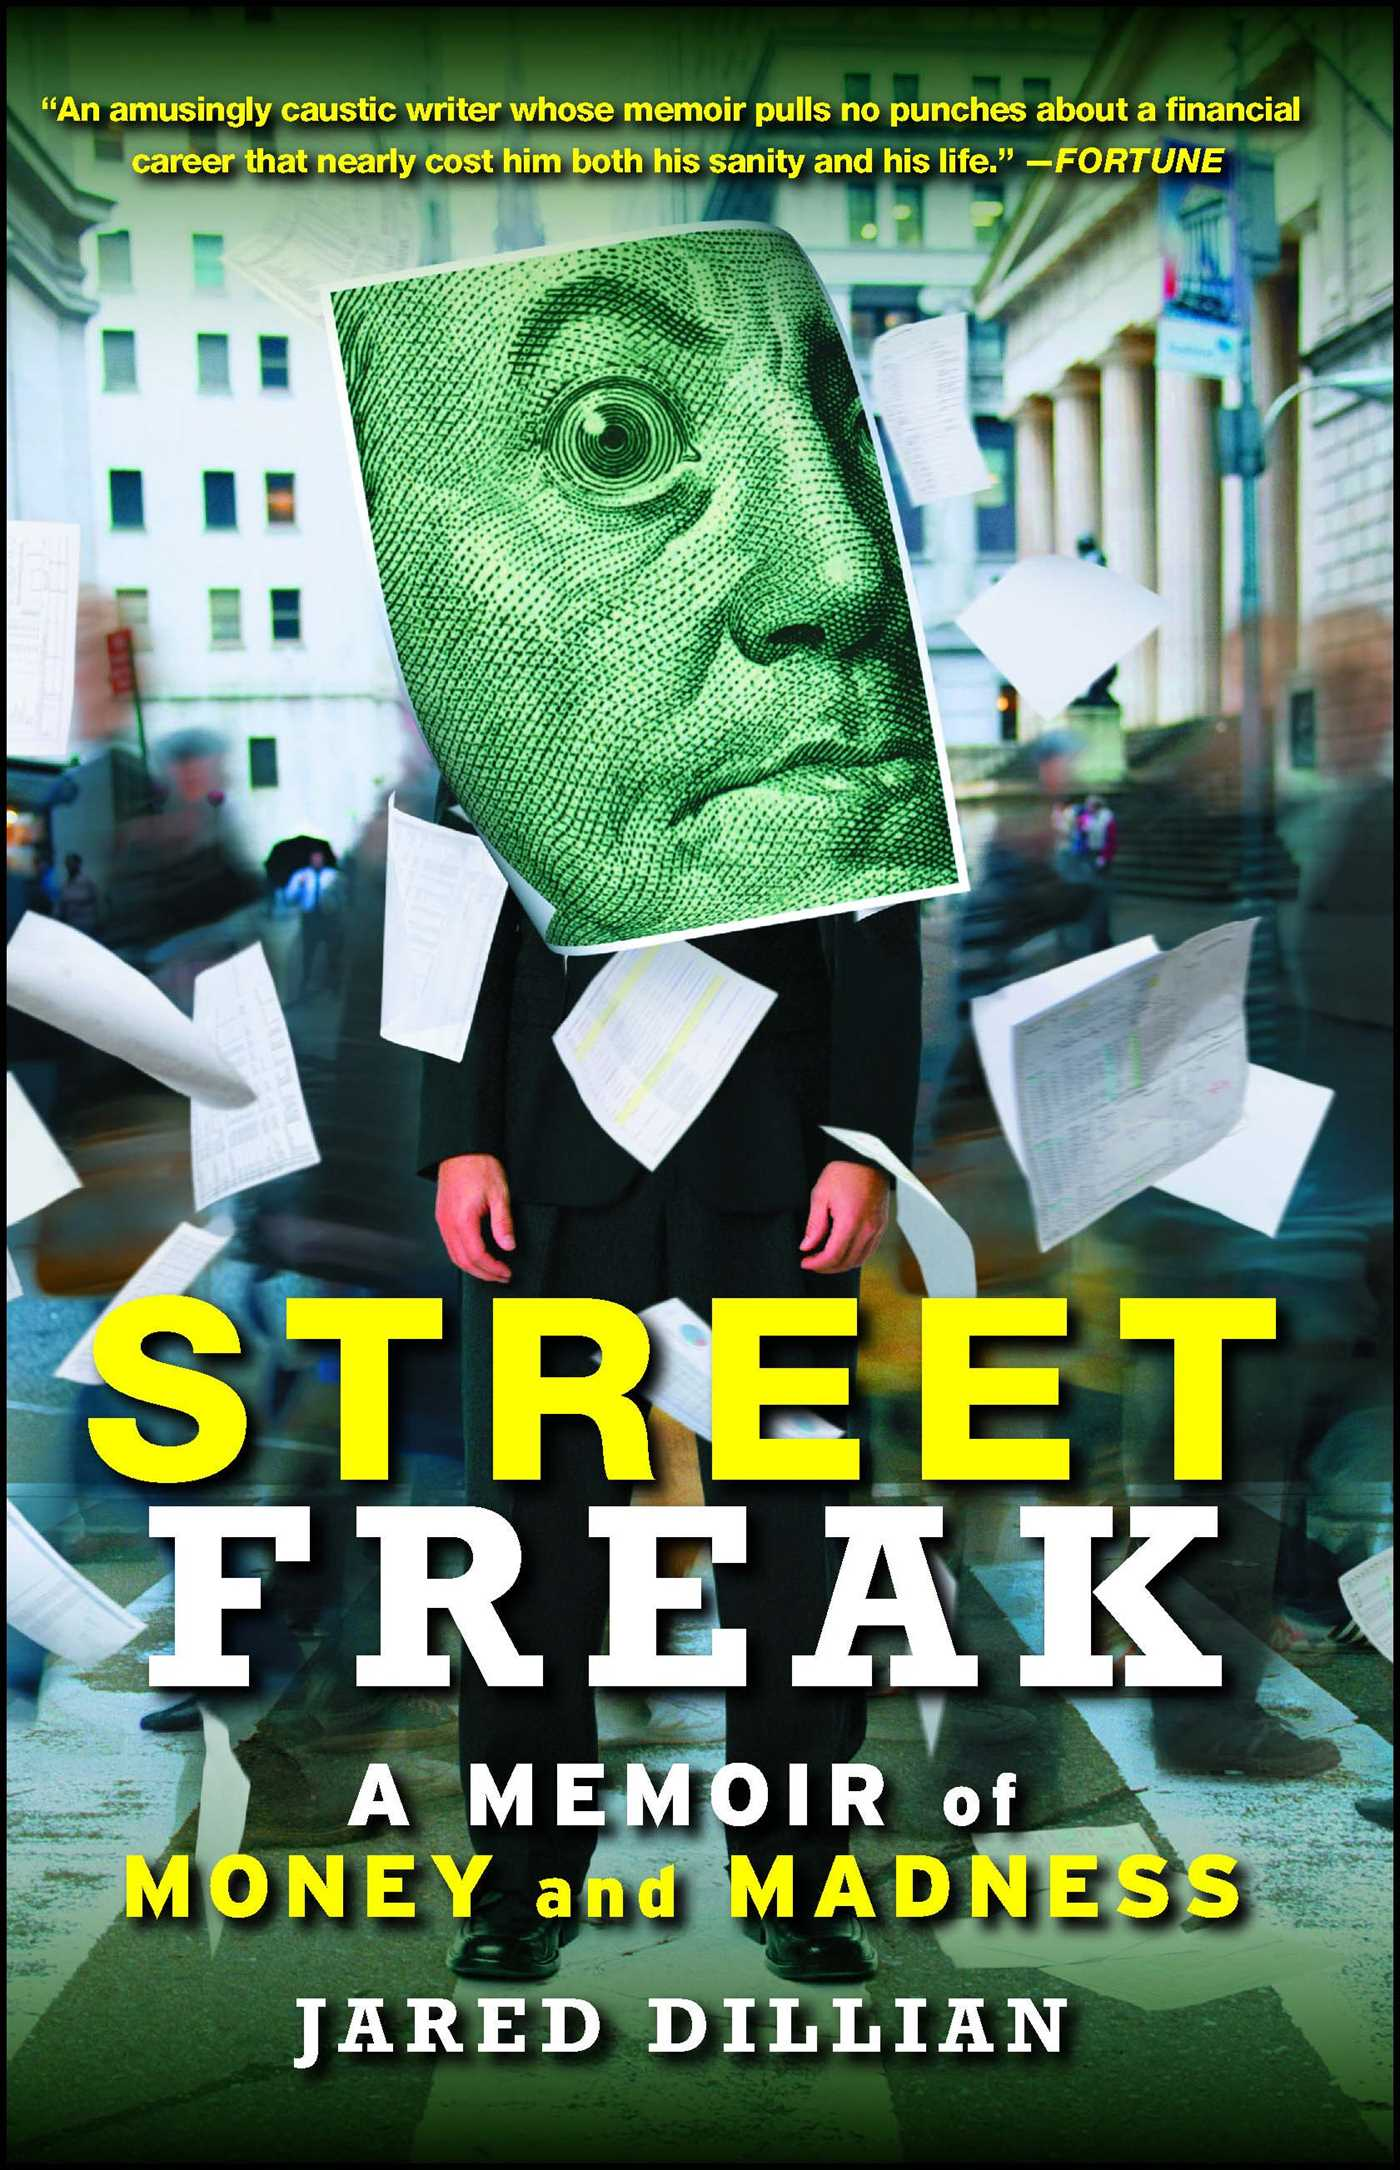 Street freak 9781439181270 hr